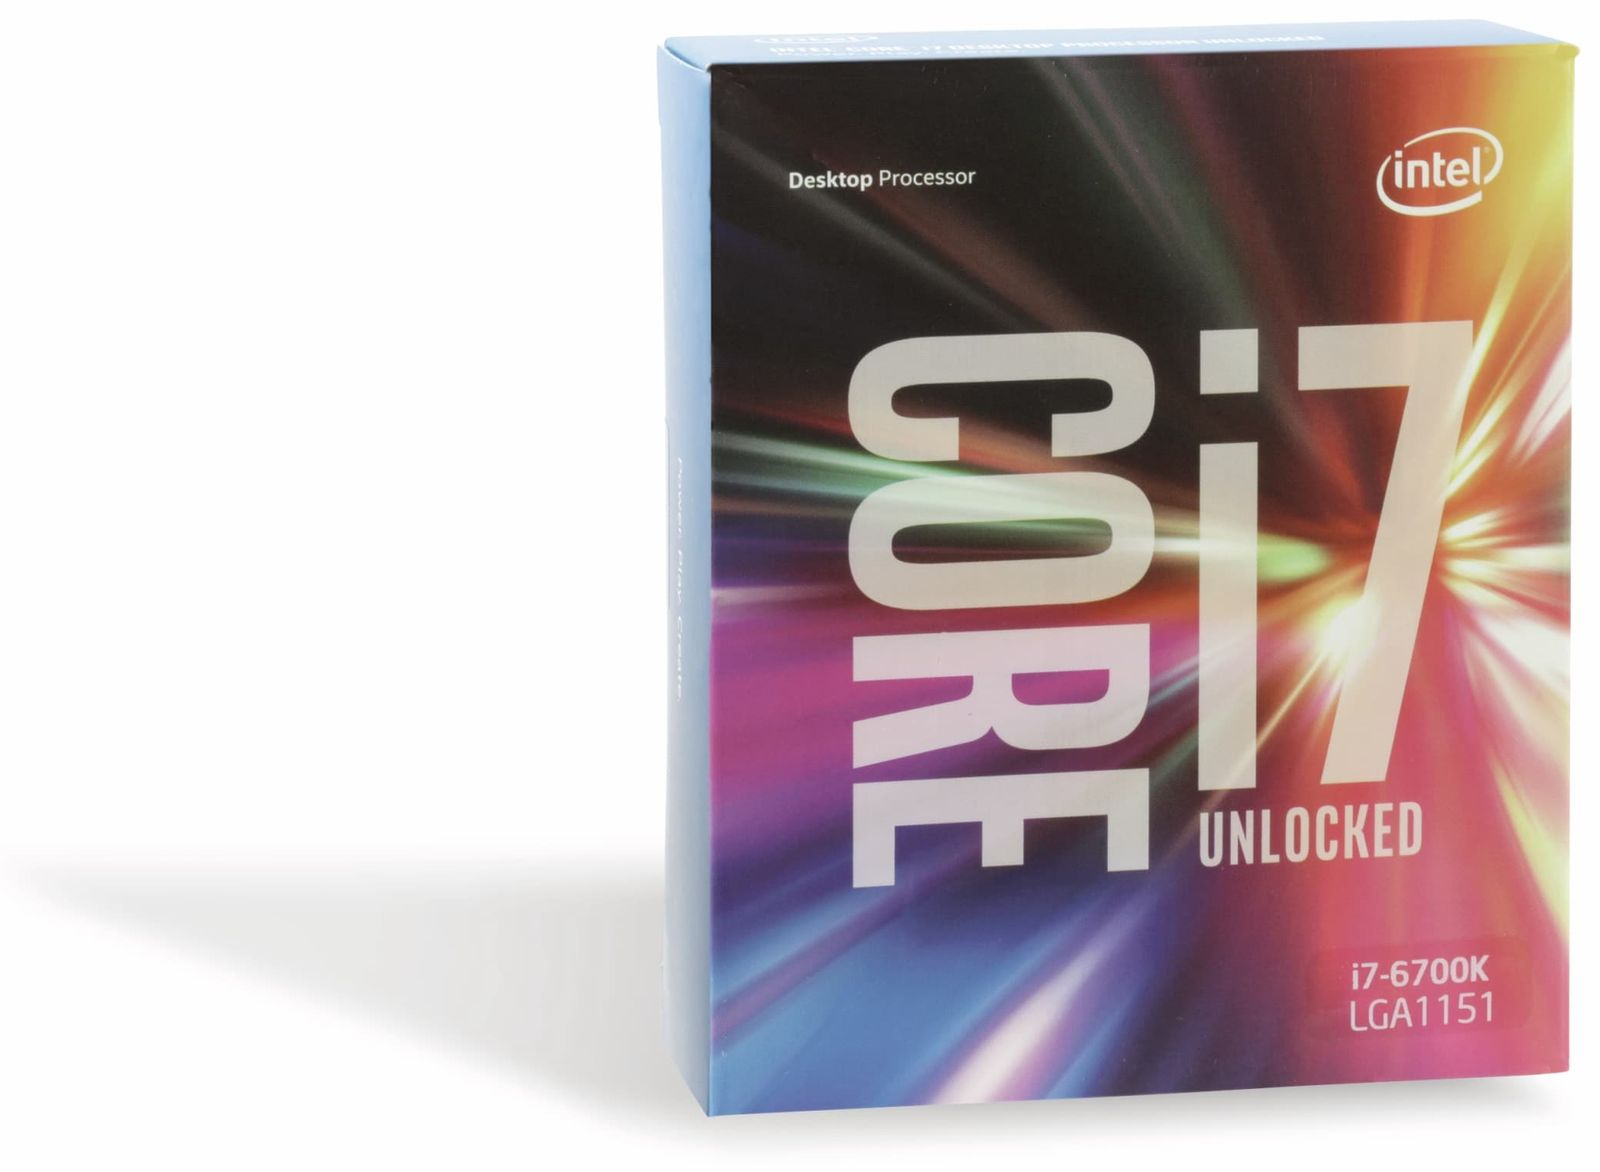 CPU Intel Core i7-6700K, 4GHz, 8MB